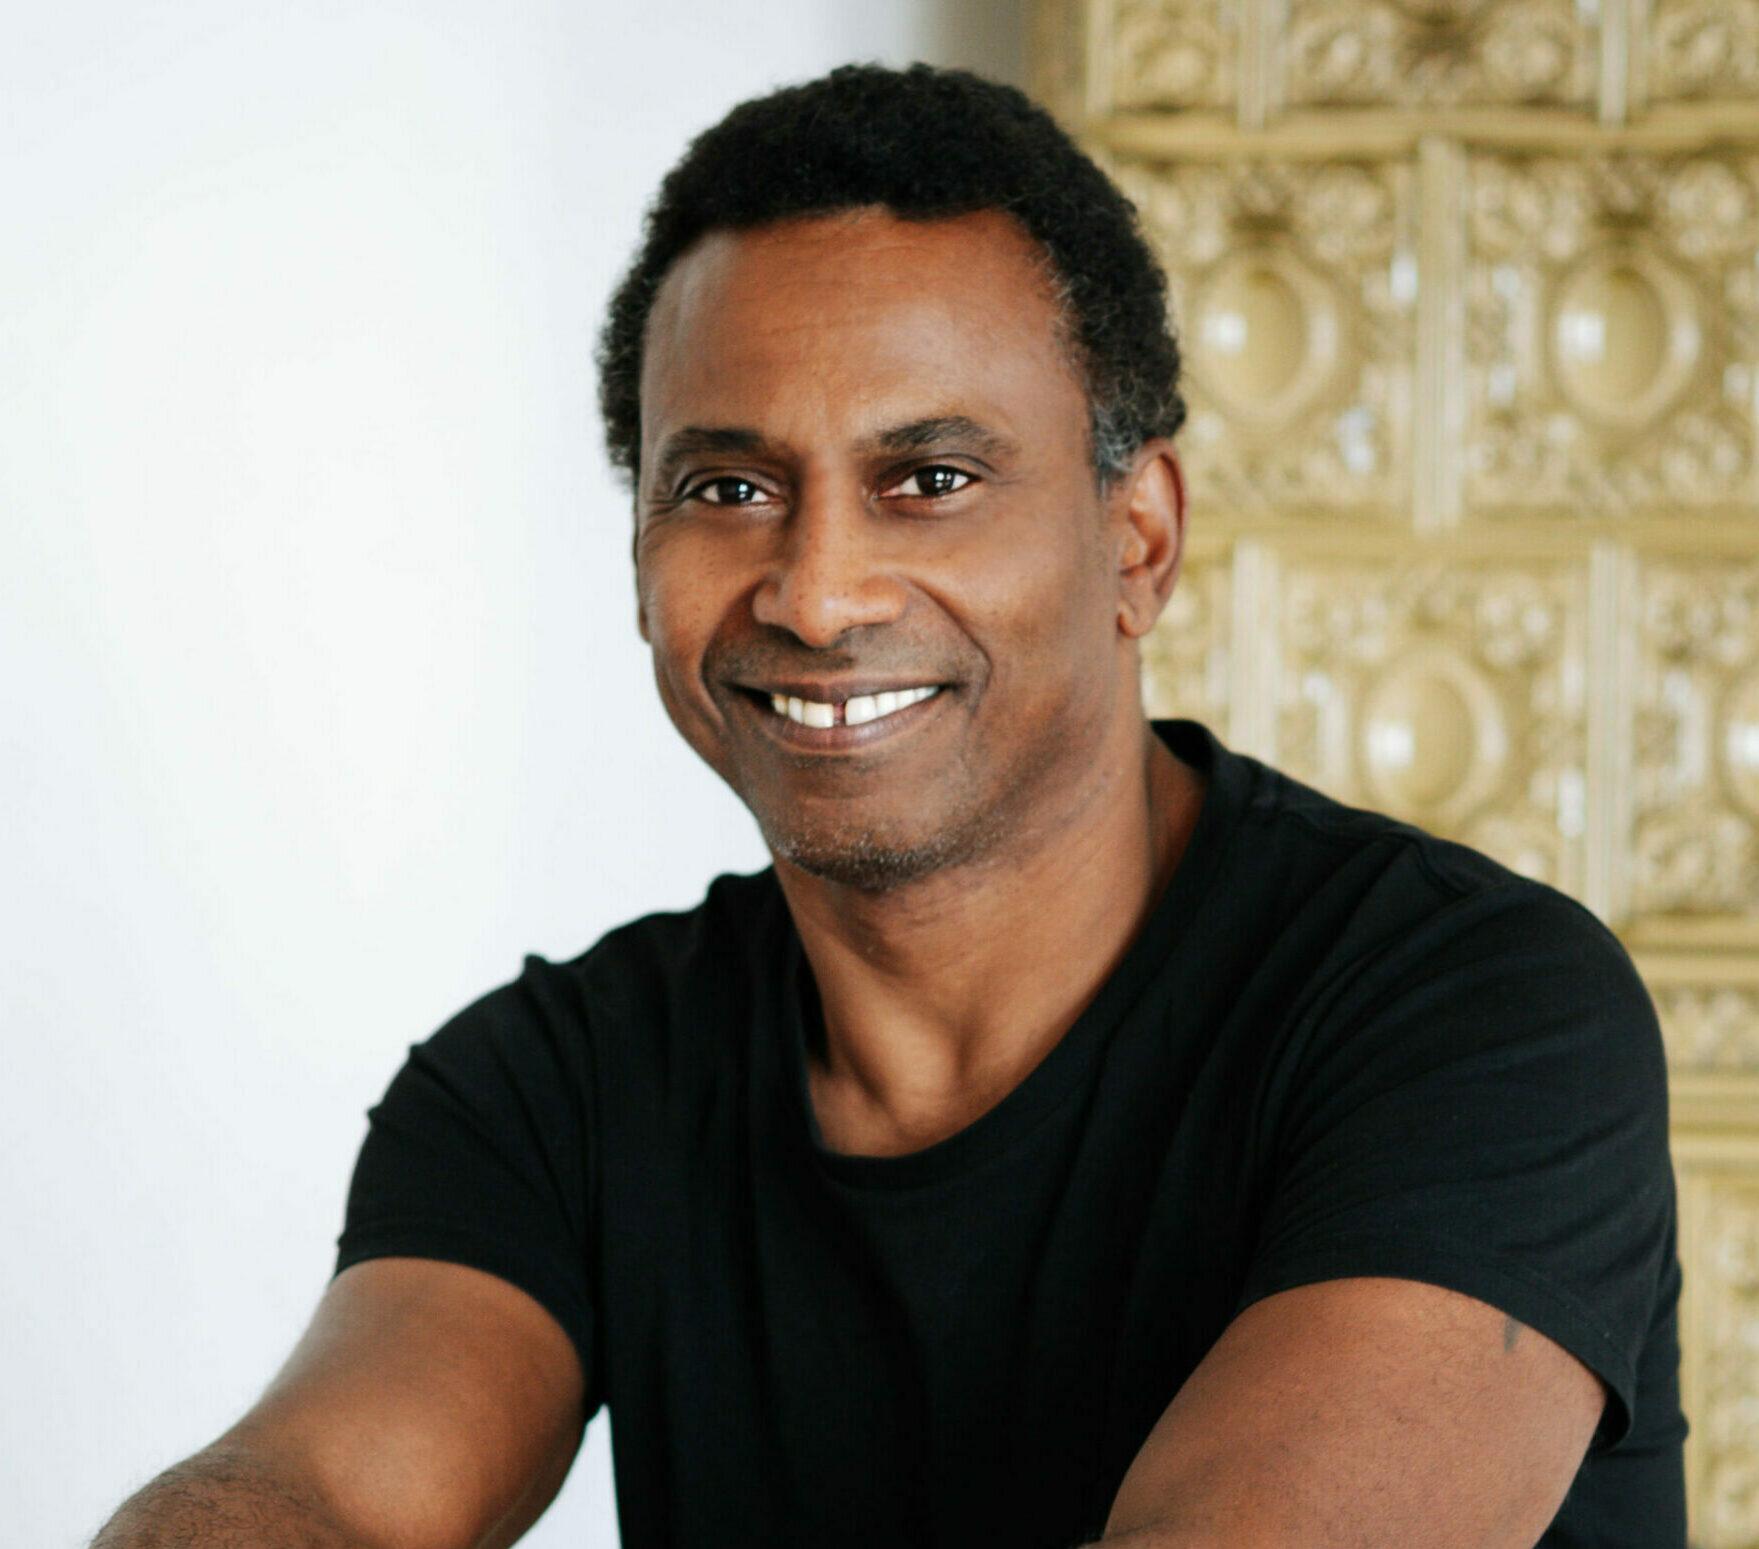 Portrait of Michael Sidhamo Johnson - Yin Yoga teacher at RE:TREAT